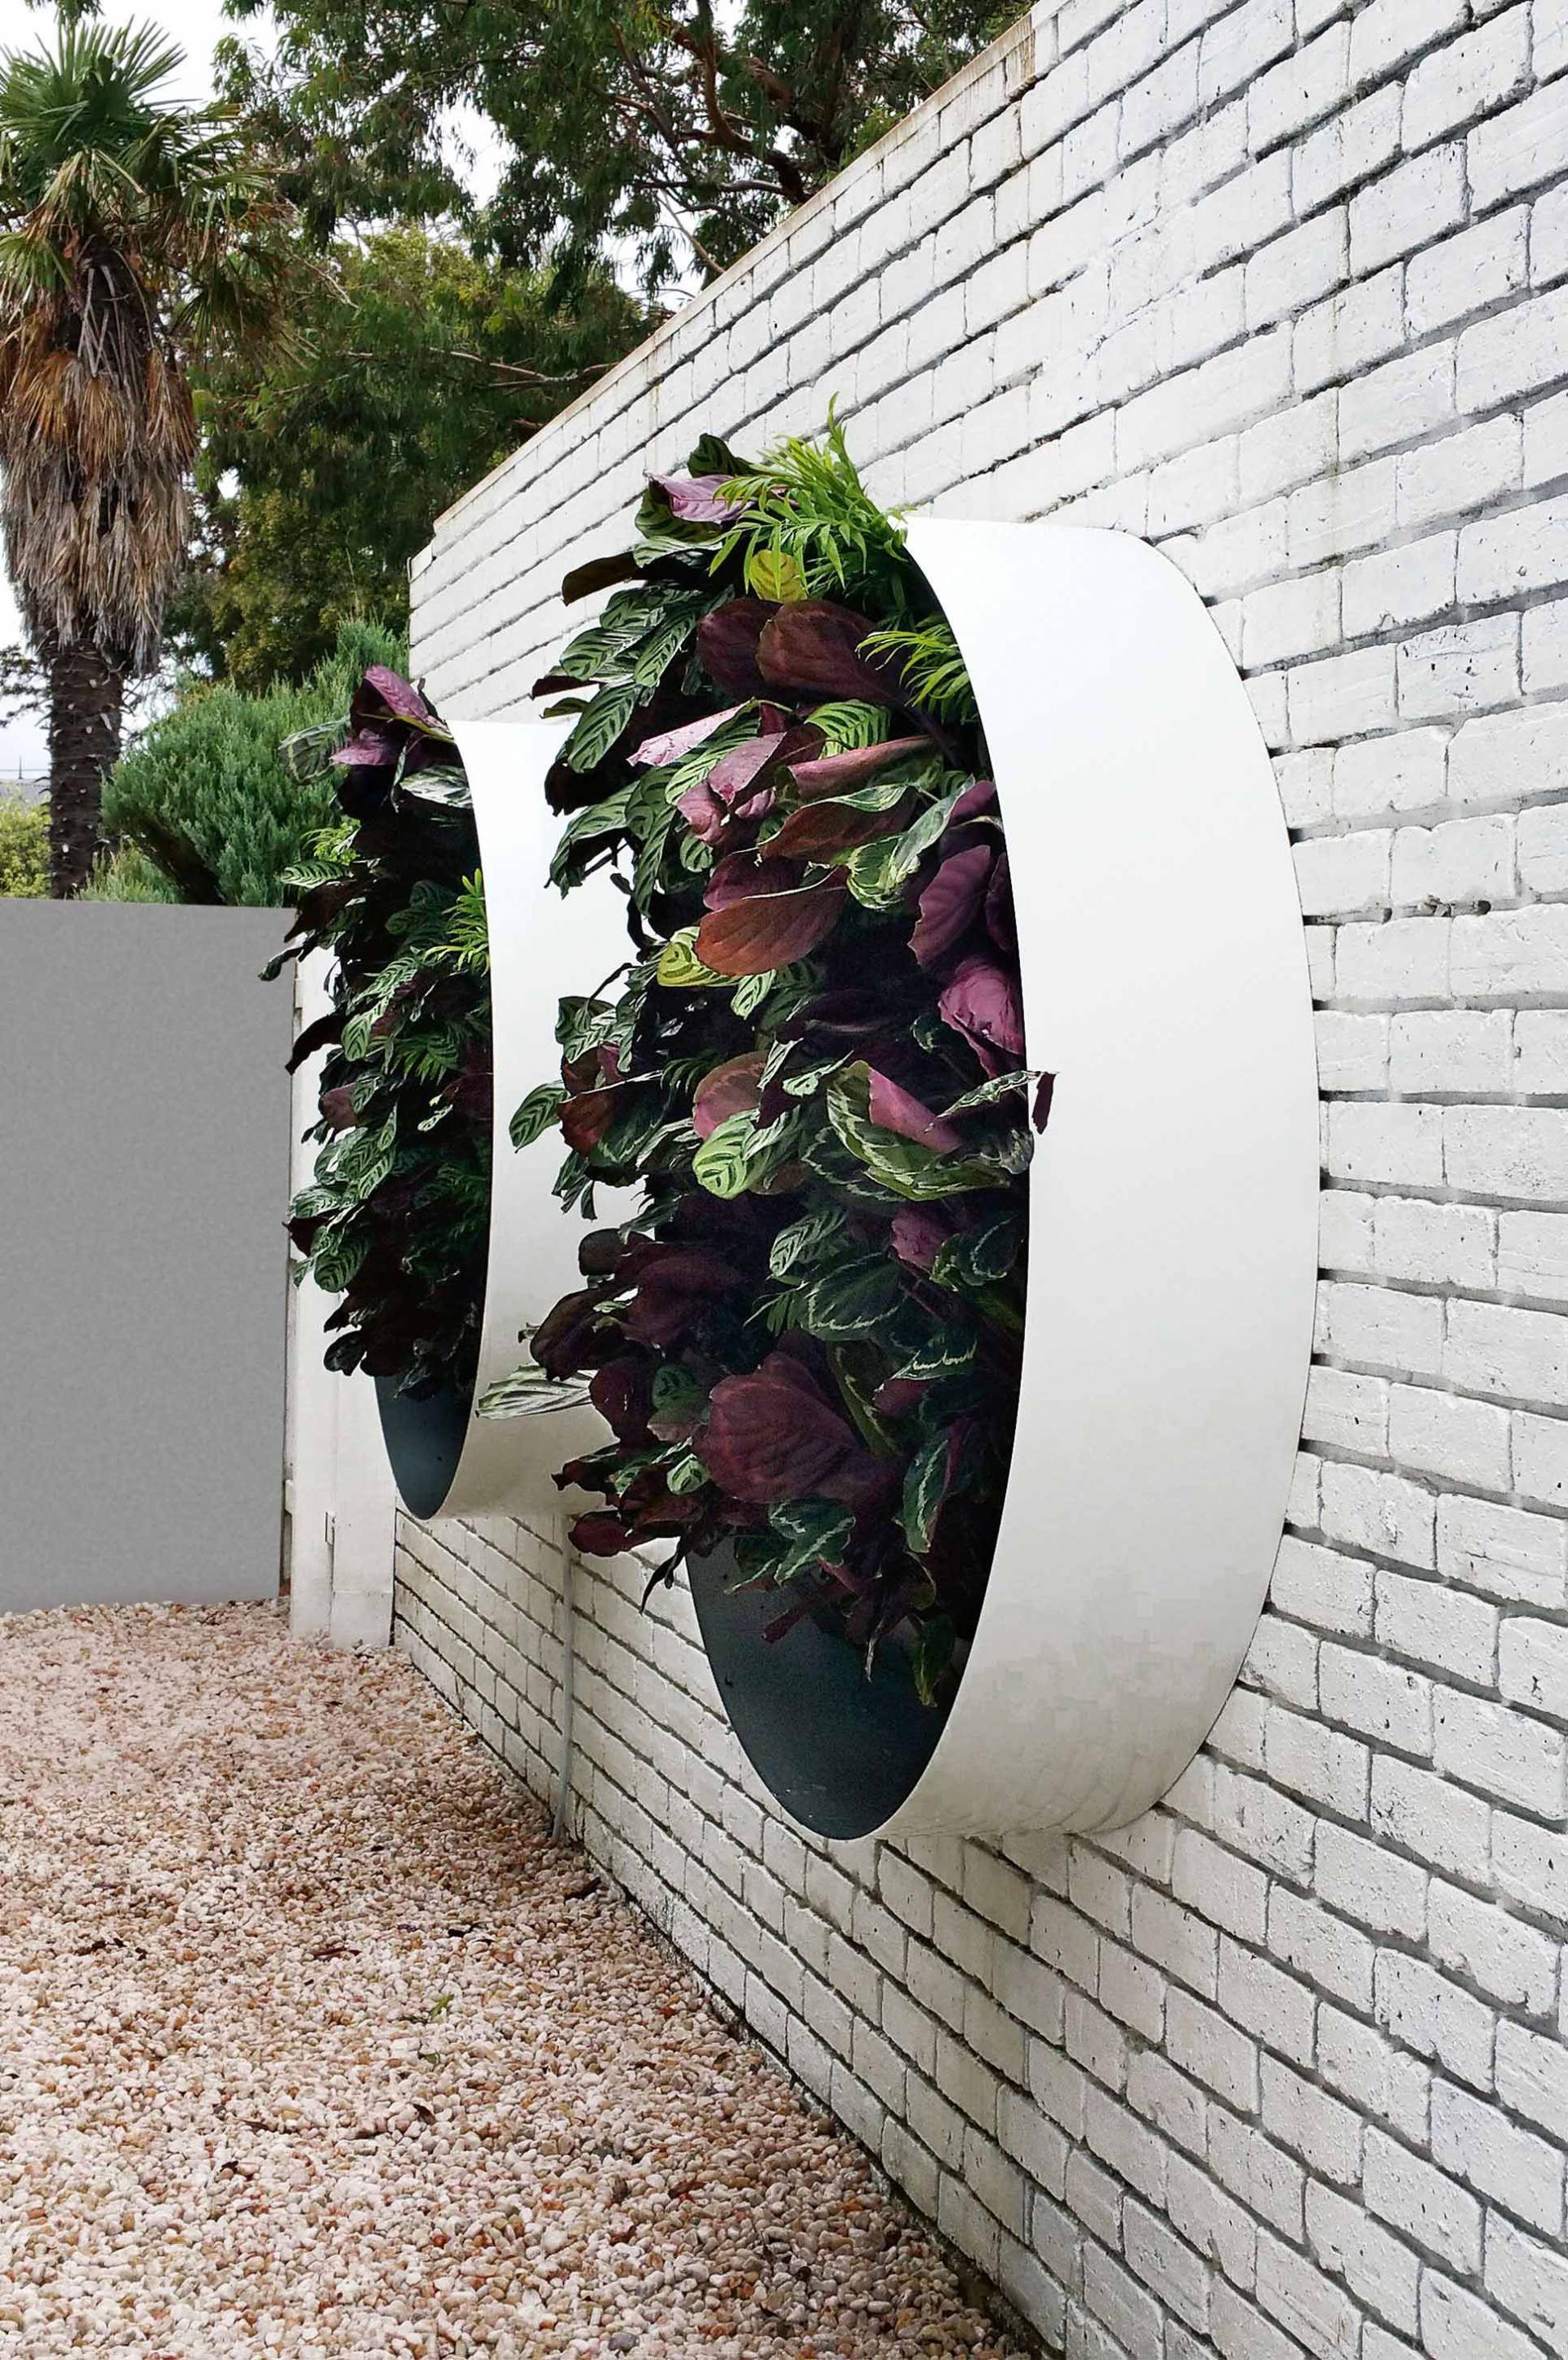 Vertical garden design with orchids space saving backyard landscaping - Creative Inspiring Vertical Gardens Design By Vertical Gardens Australia From The October 2015